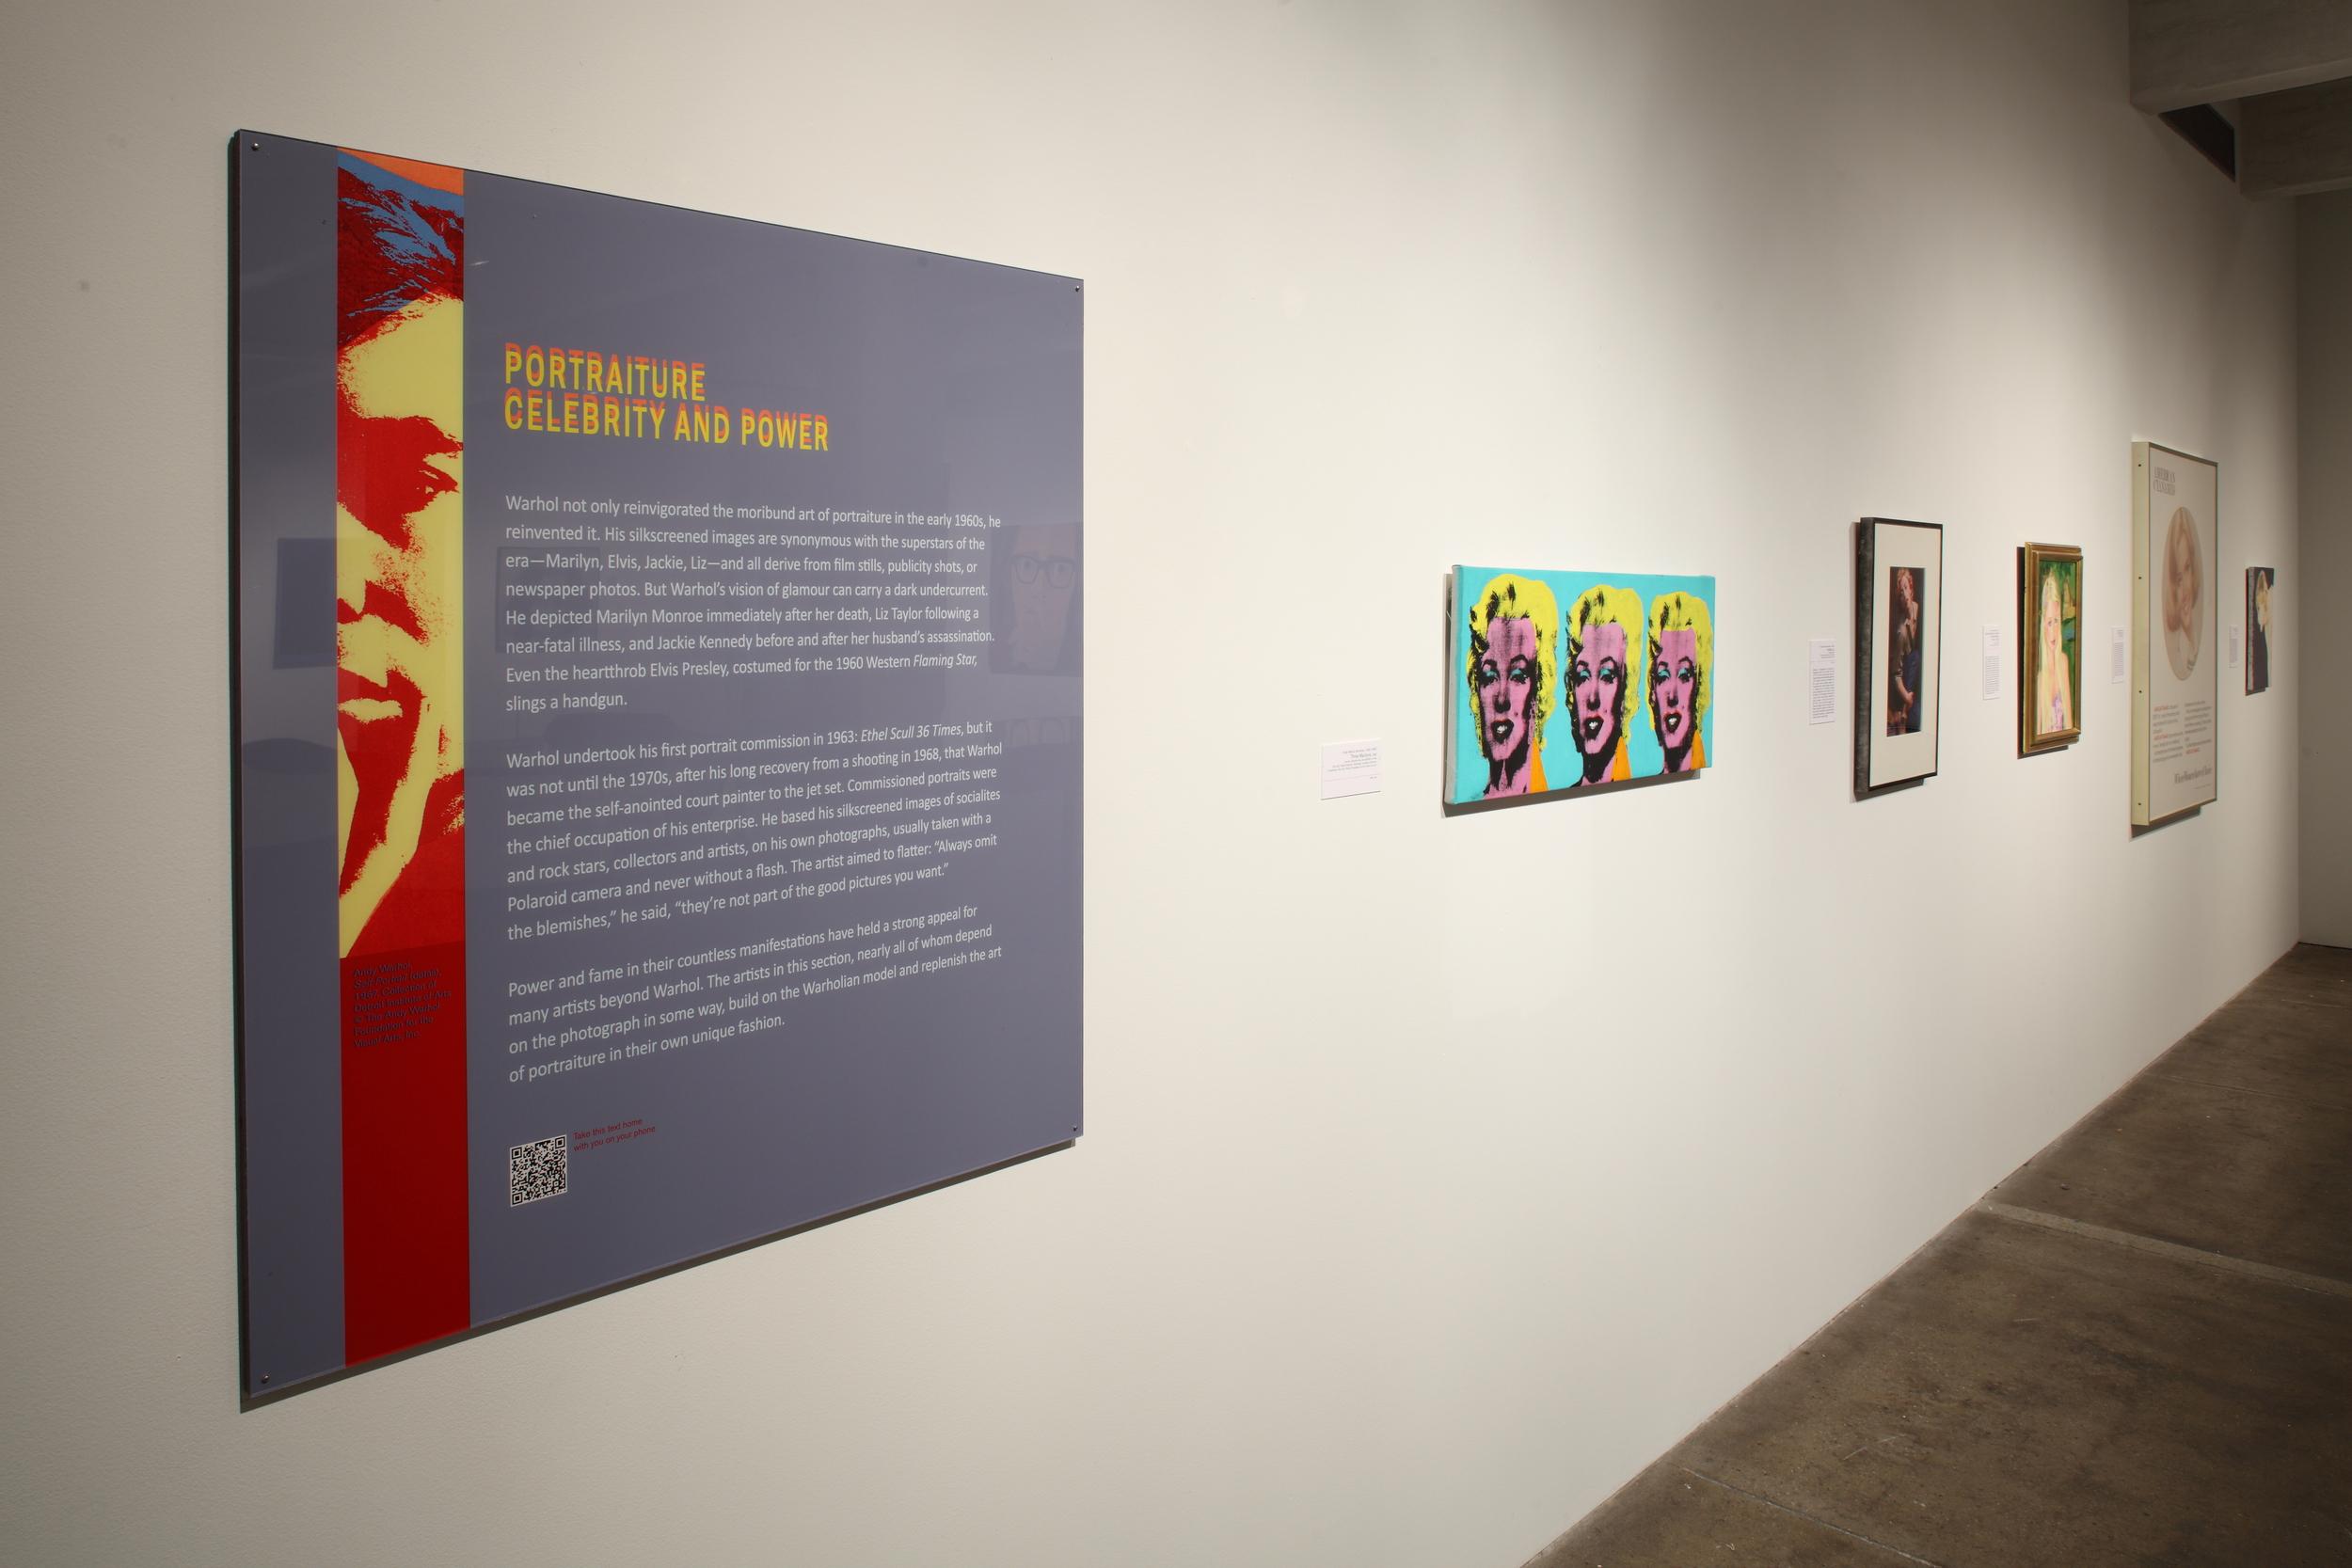 Regarding Warhol at The Andy Warhol Museum, 2013 G501 0001.JPG